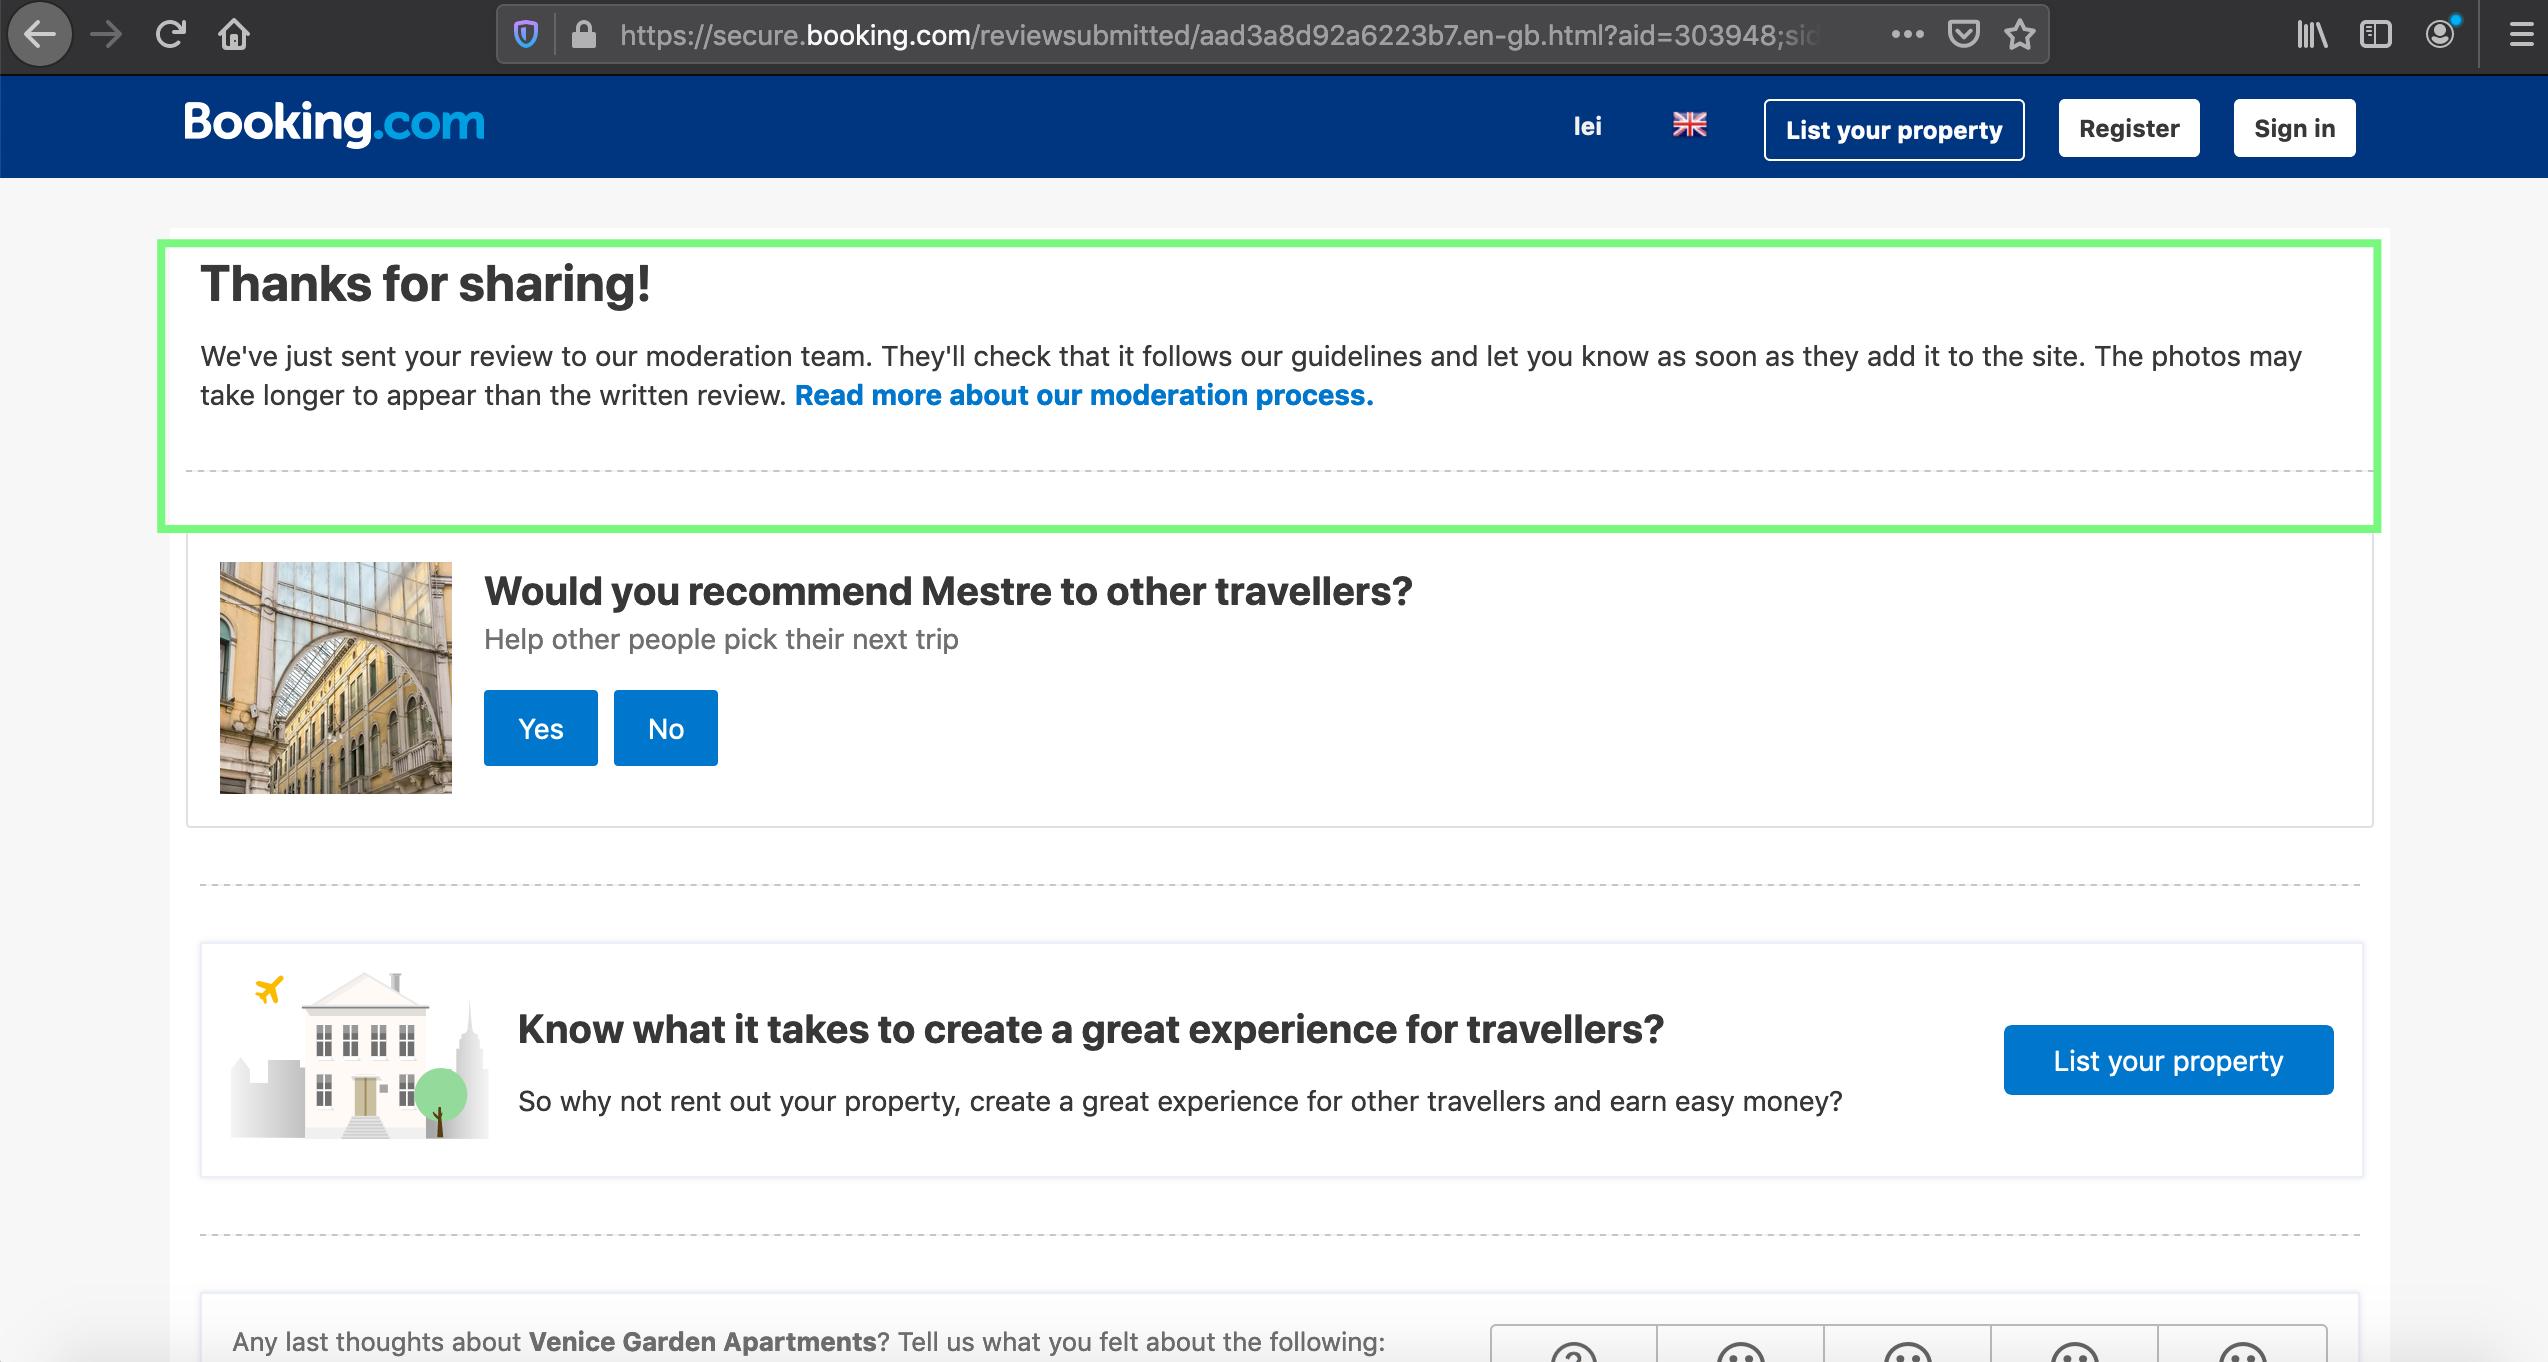 secure booking com - see bug description